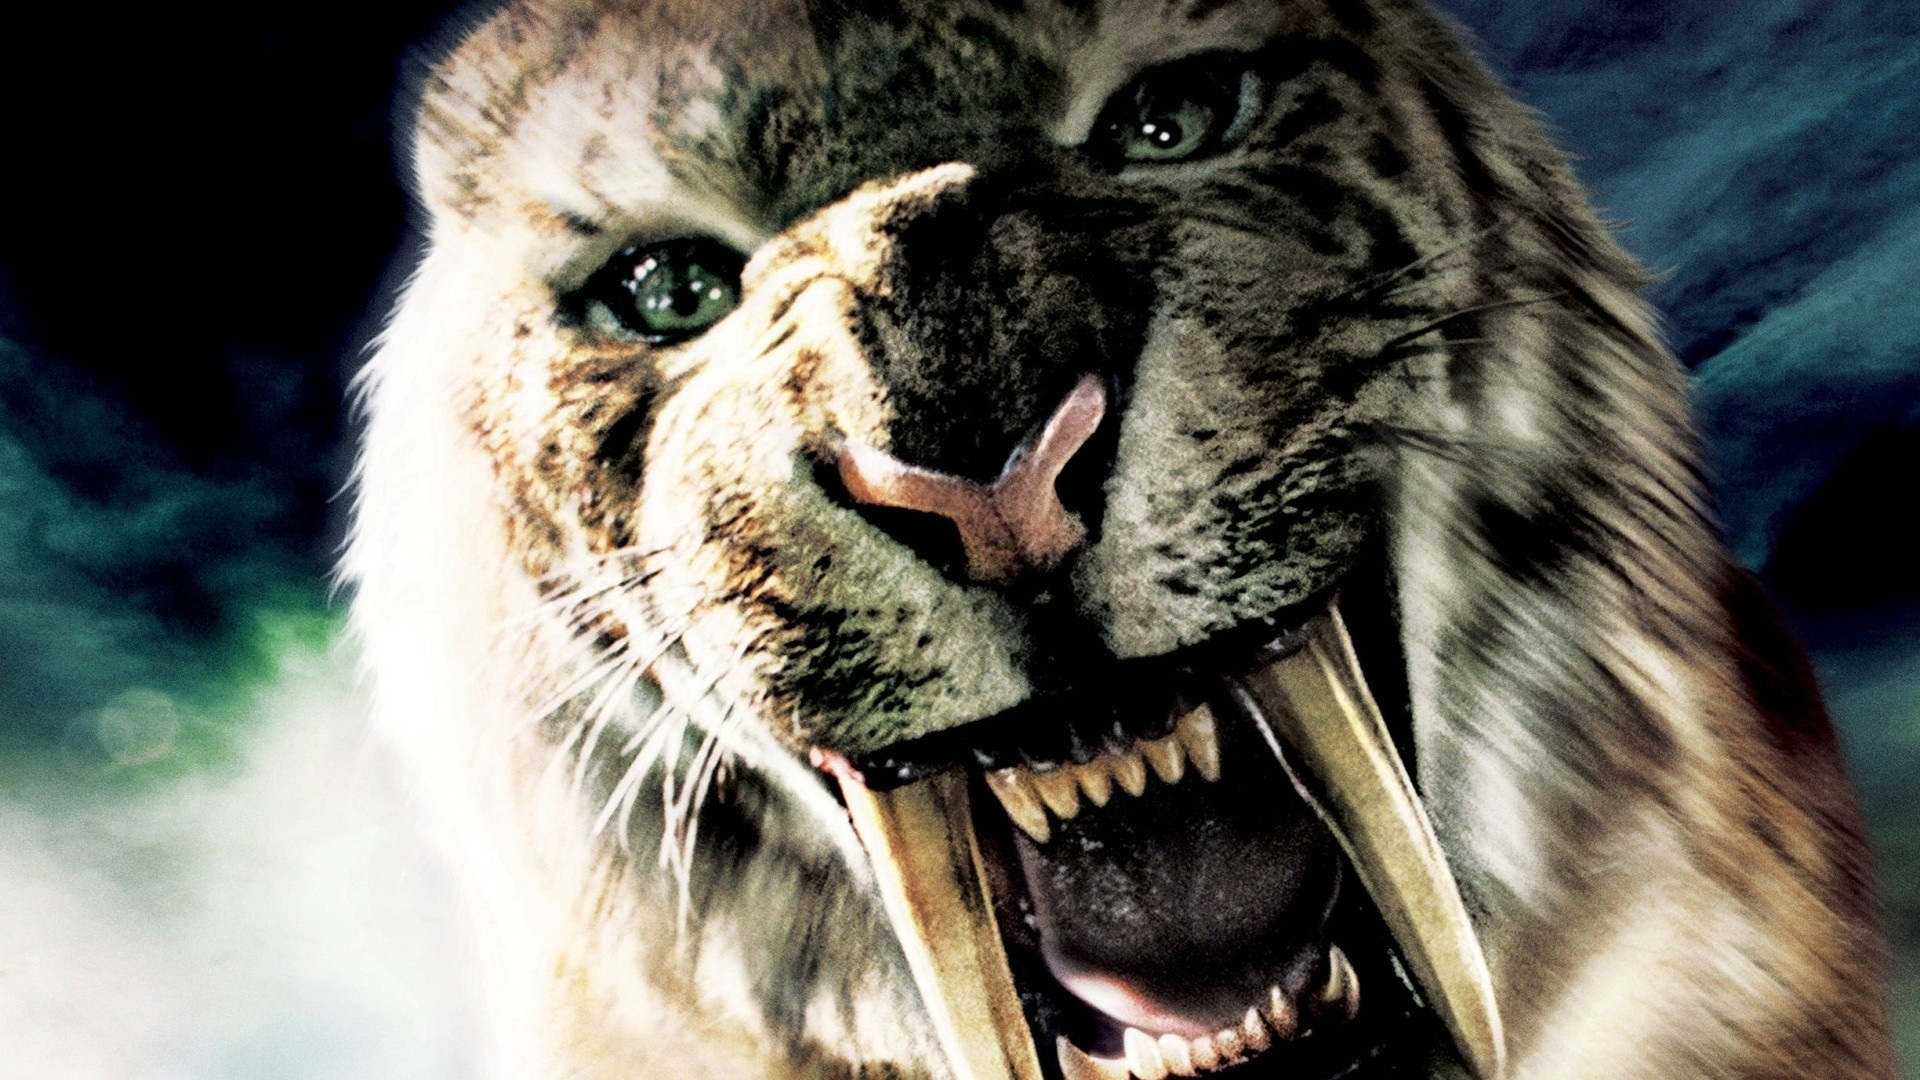 saber tooth tiger full hd fond d'écran and arrière-plan | 1920x1080